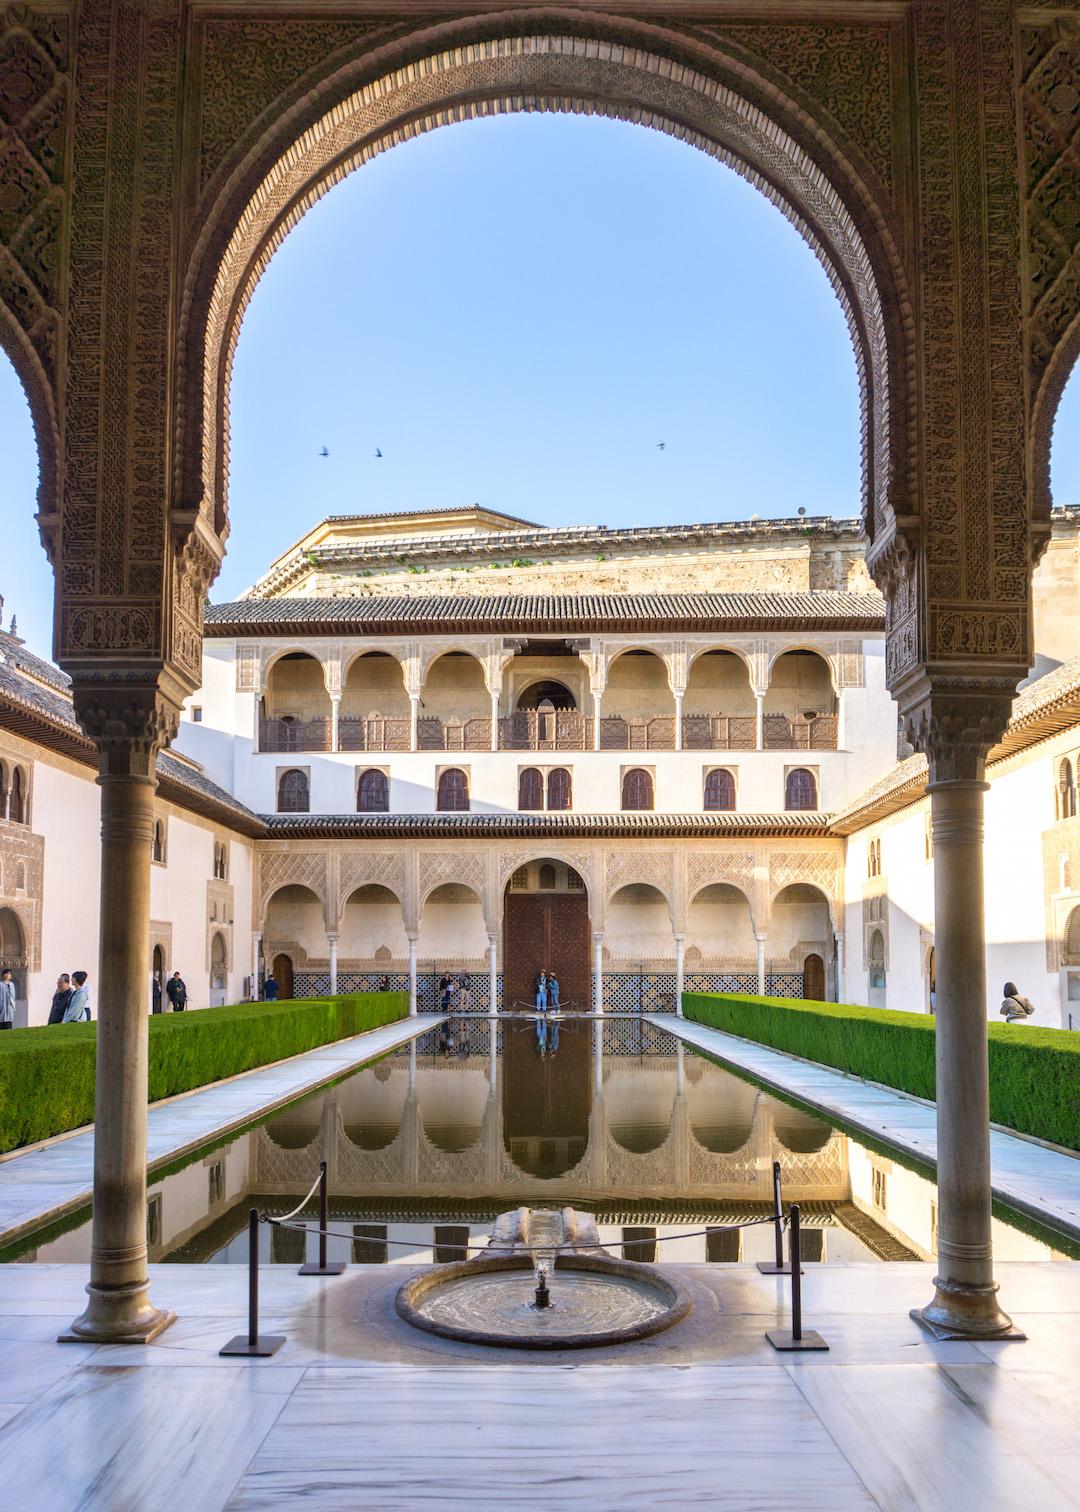 Her_Travel_Edit_Granada_Nasrid_Palace_Alhambra